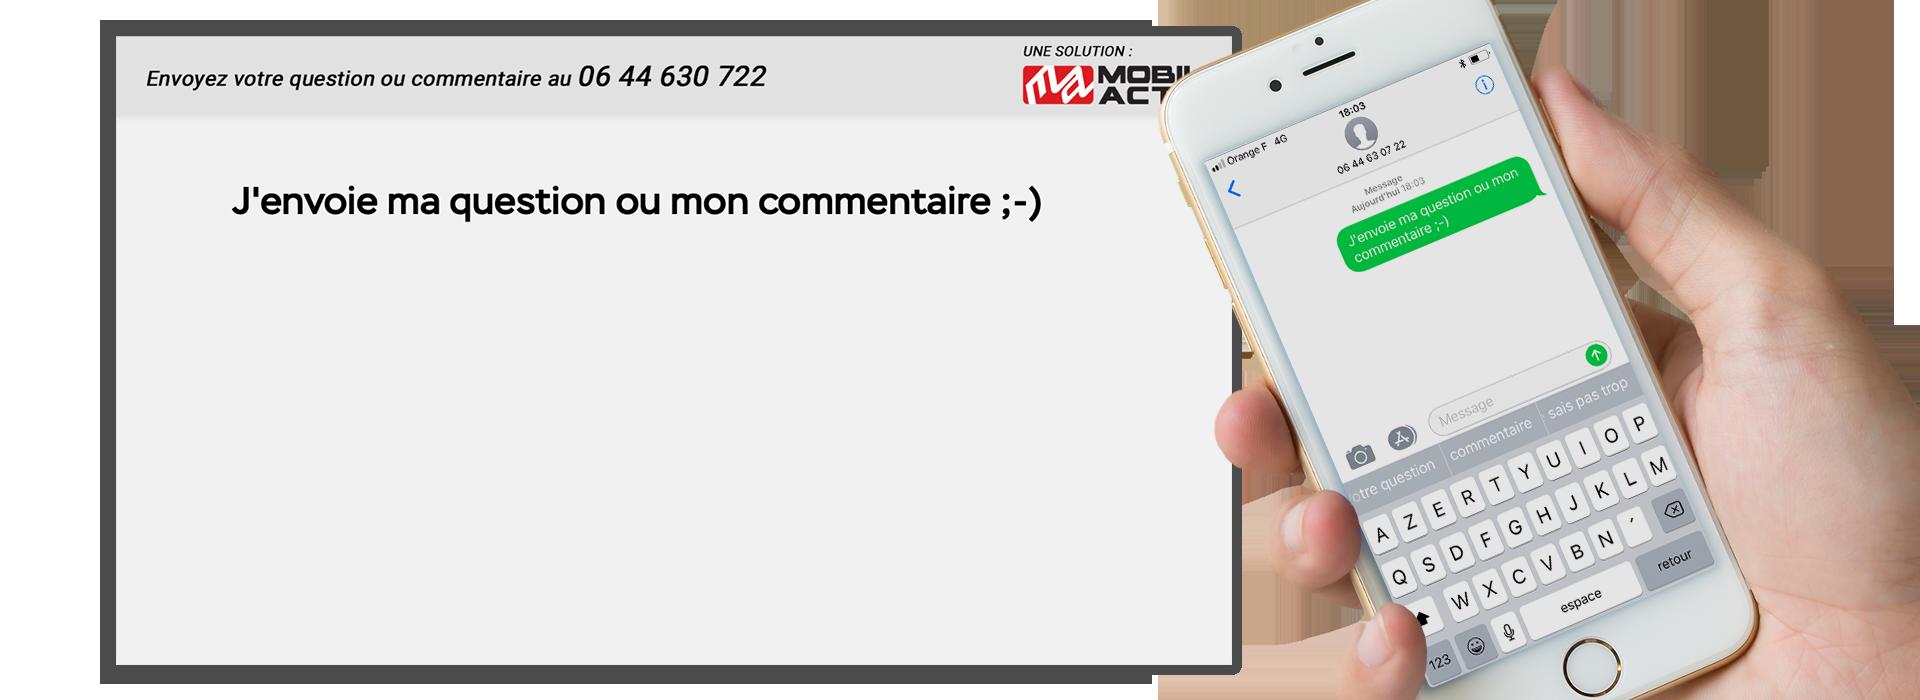 SMS_QnA